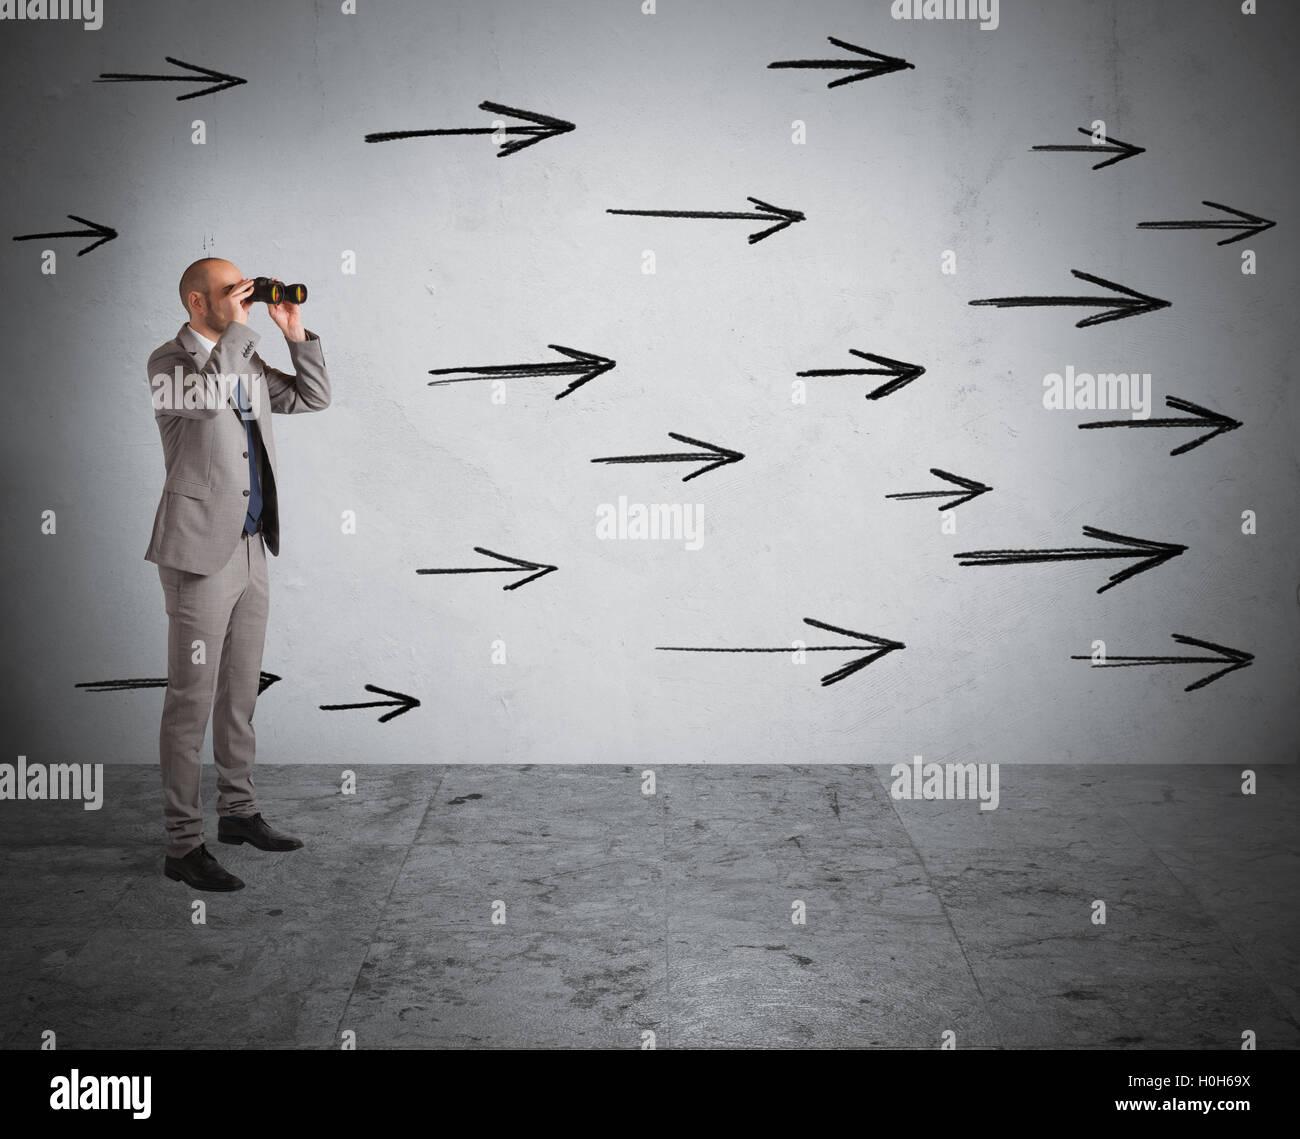 Look ahead - Stock Image